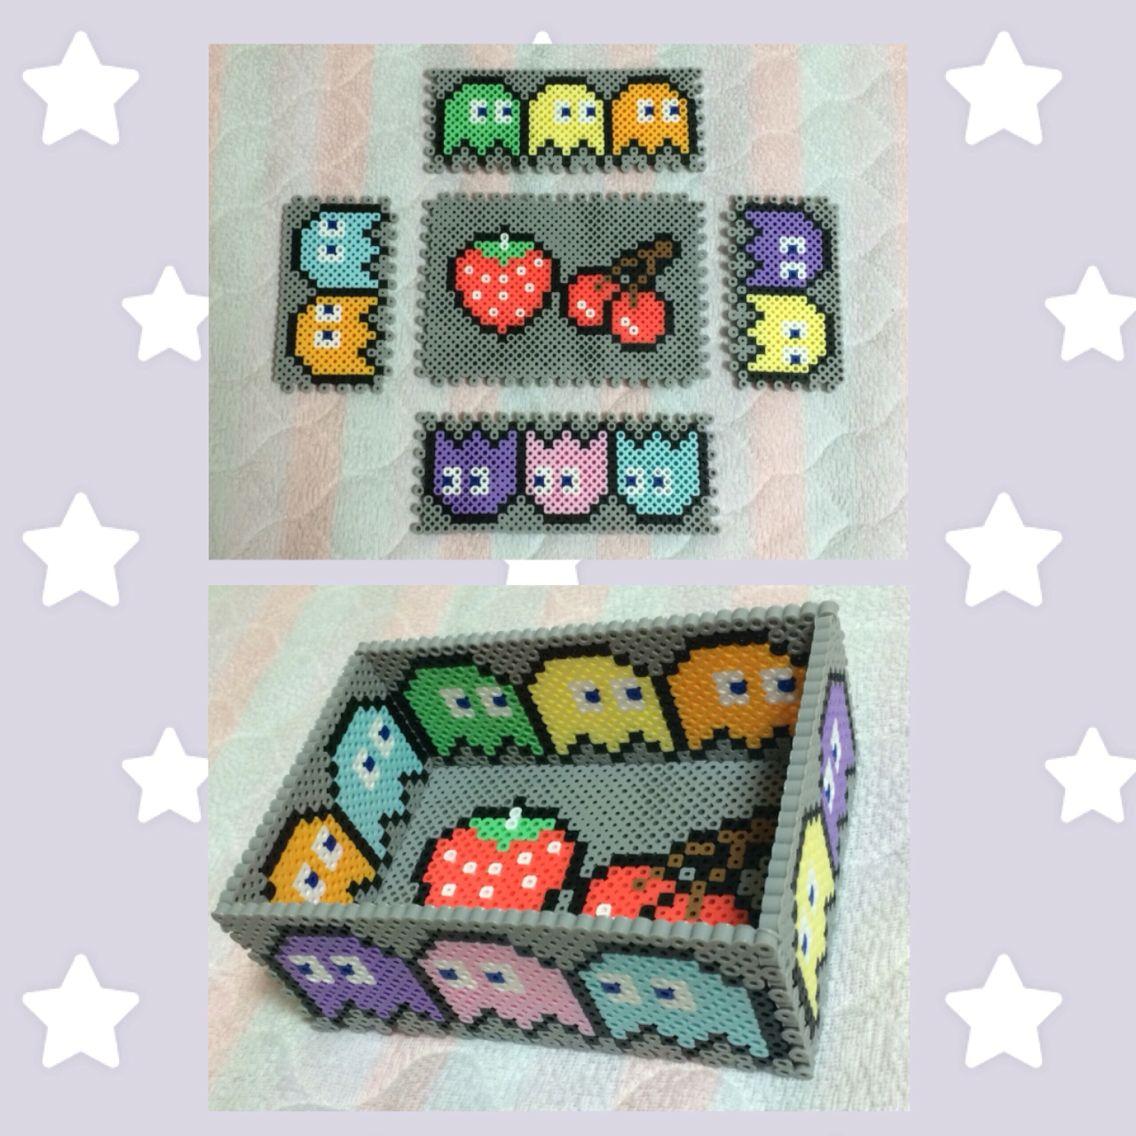 8bit hama beads perler beads 3d for Decoracion hogar 3d